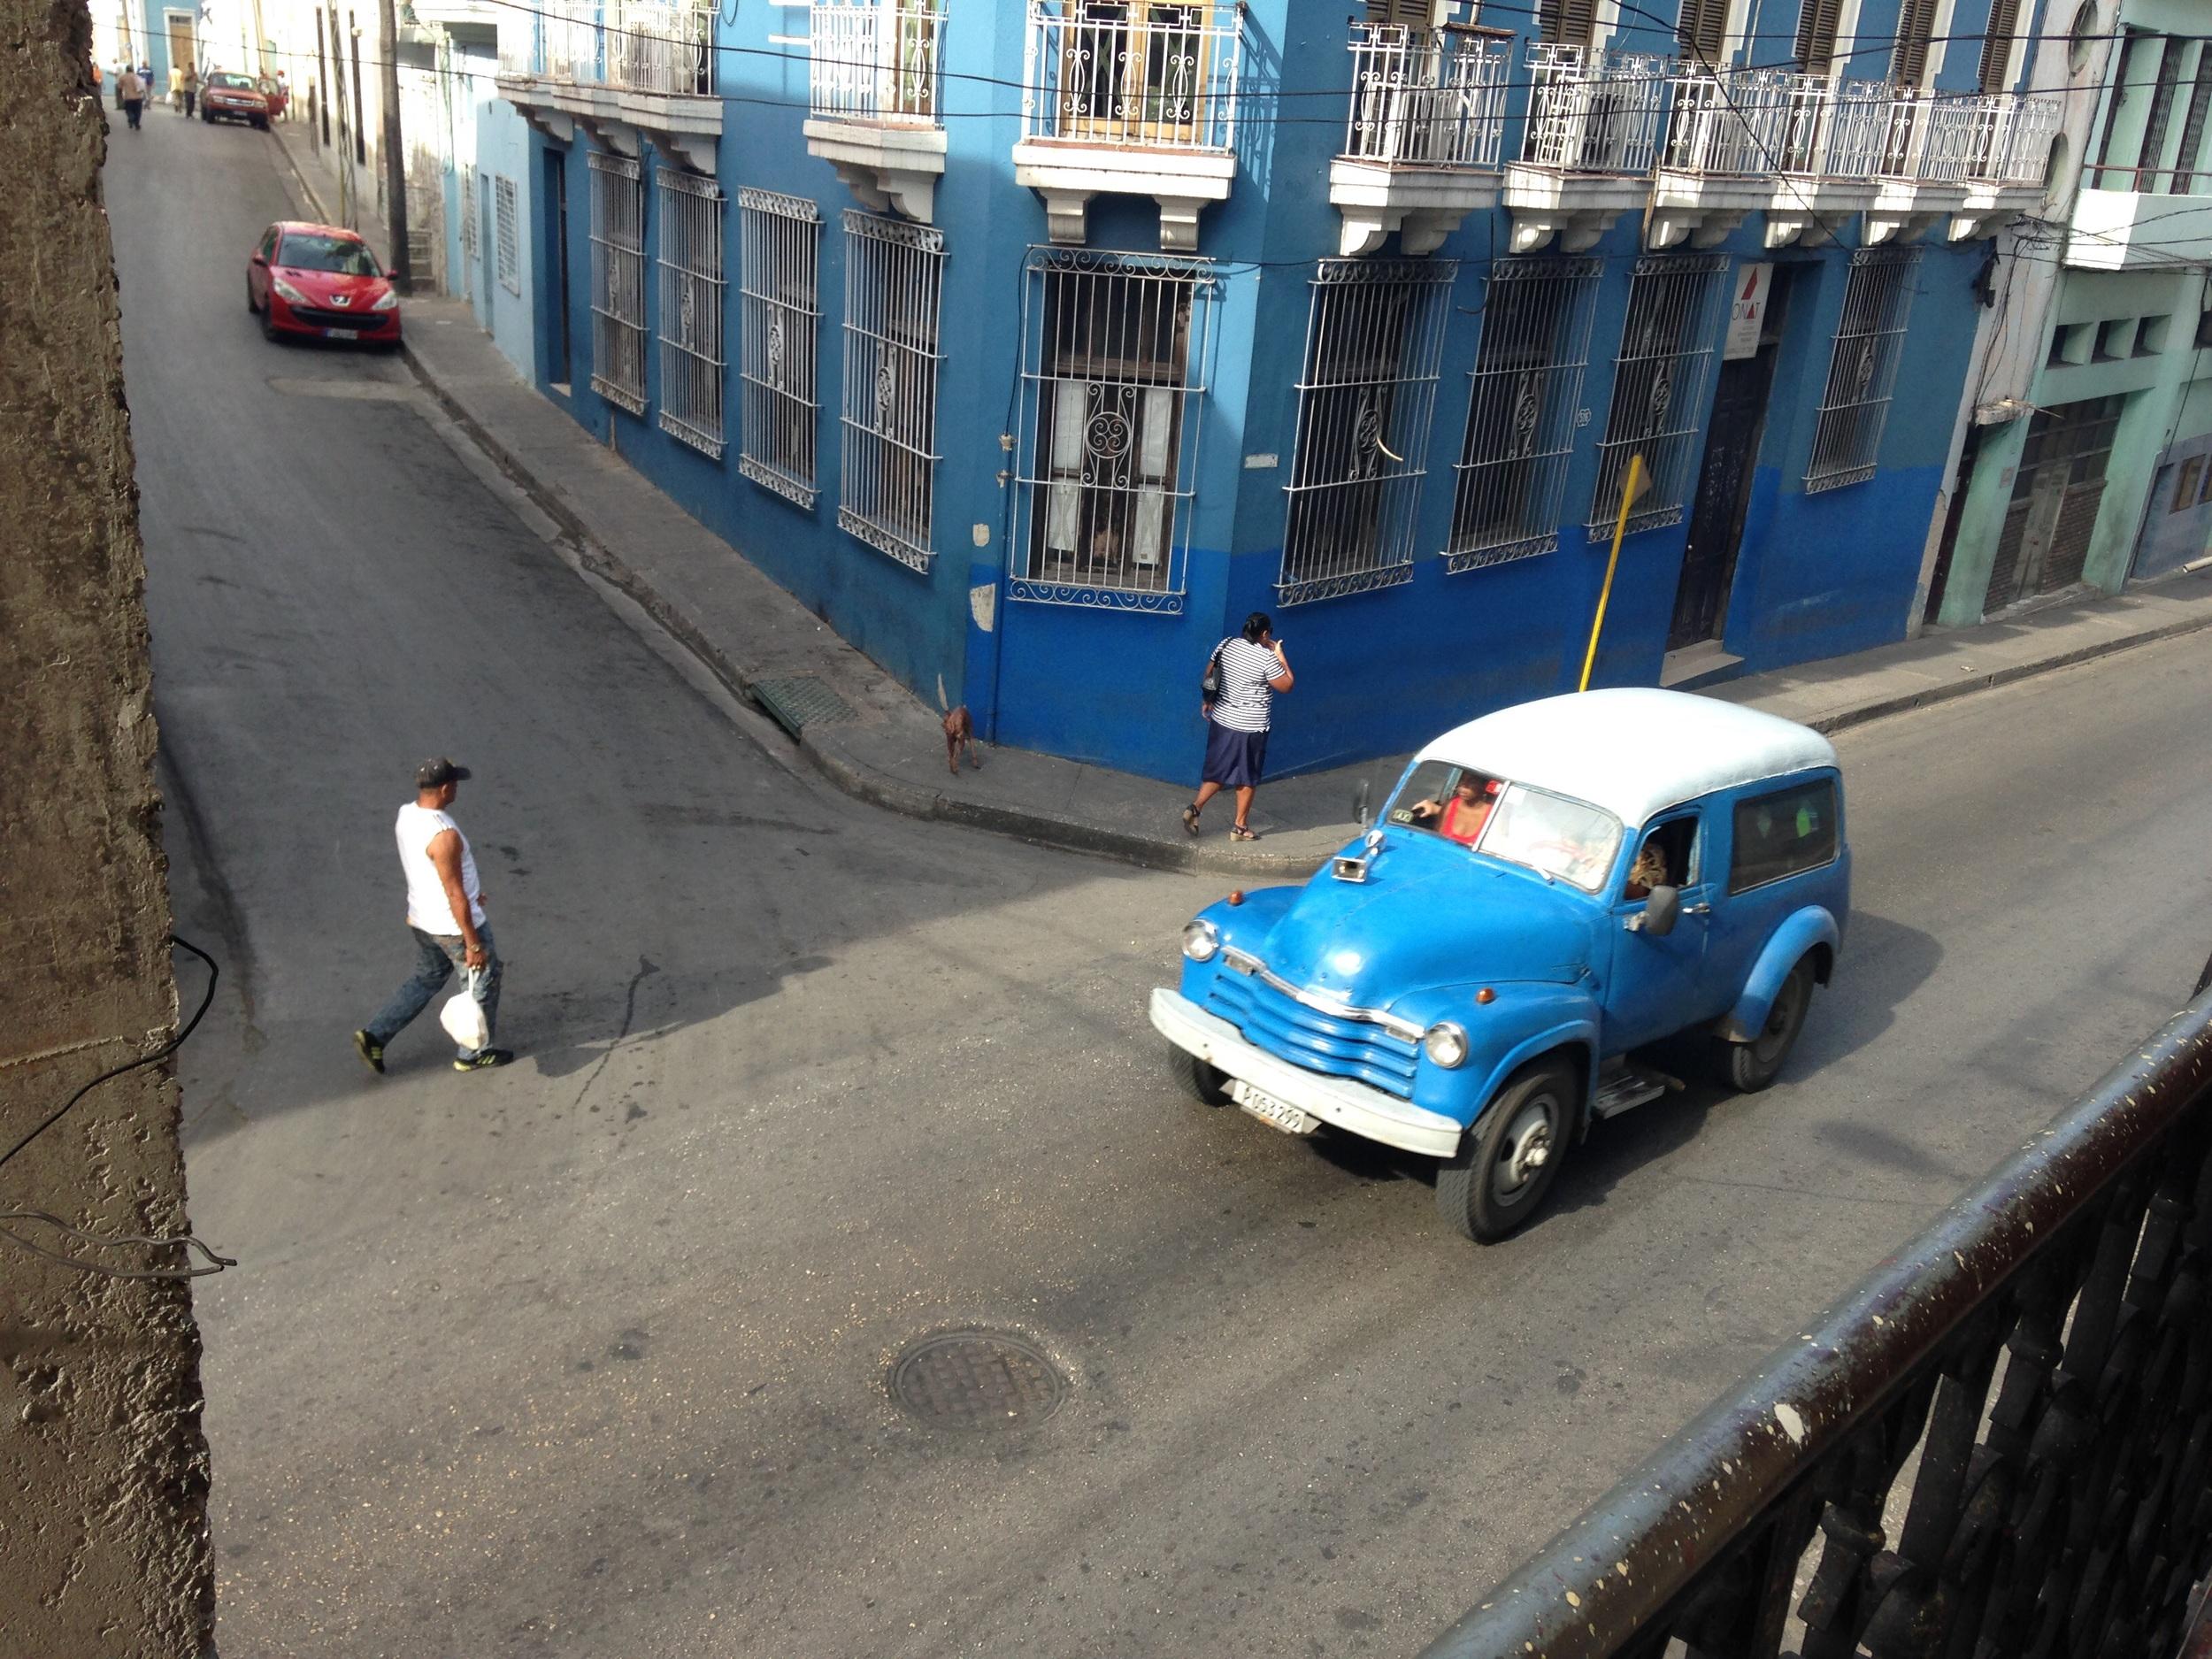 Old car and street view in Santiago de Cuba